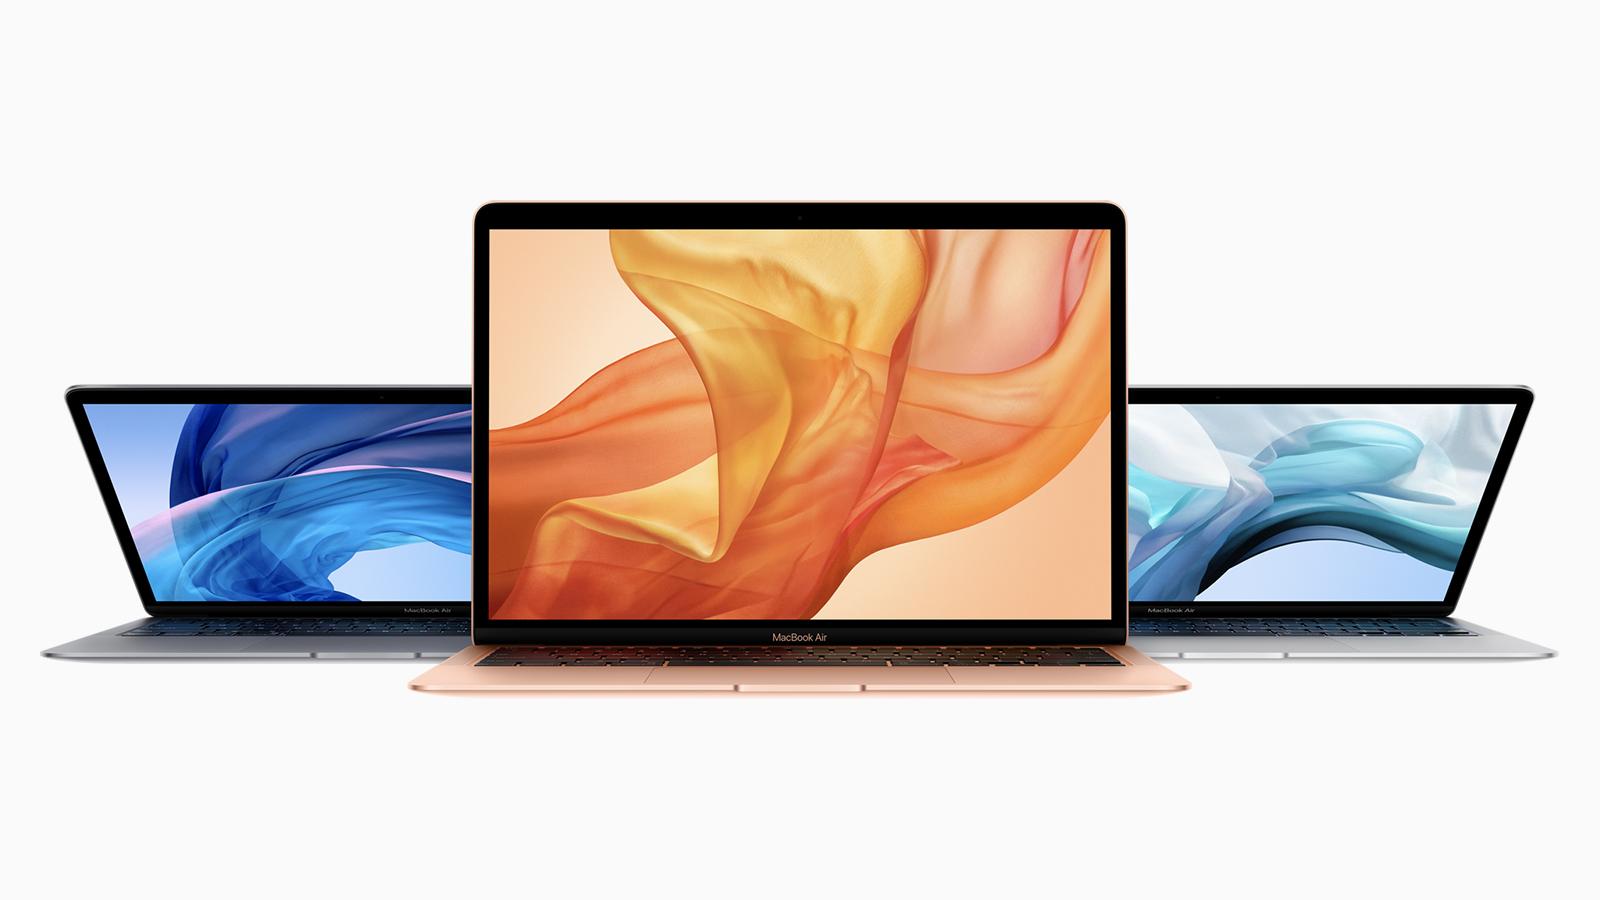 Development laptop